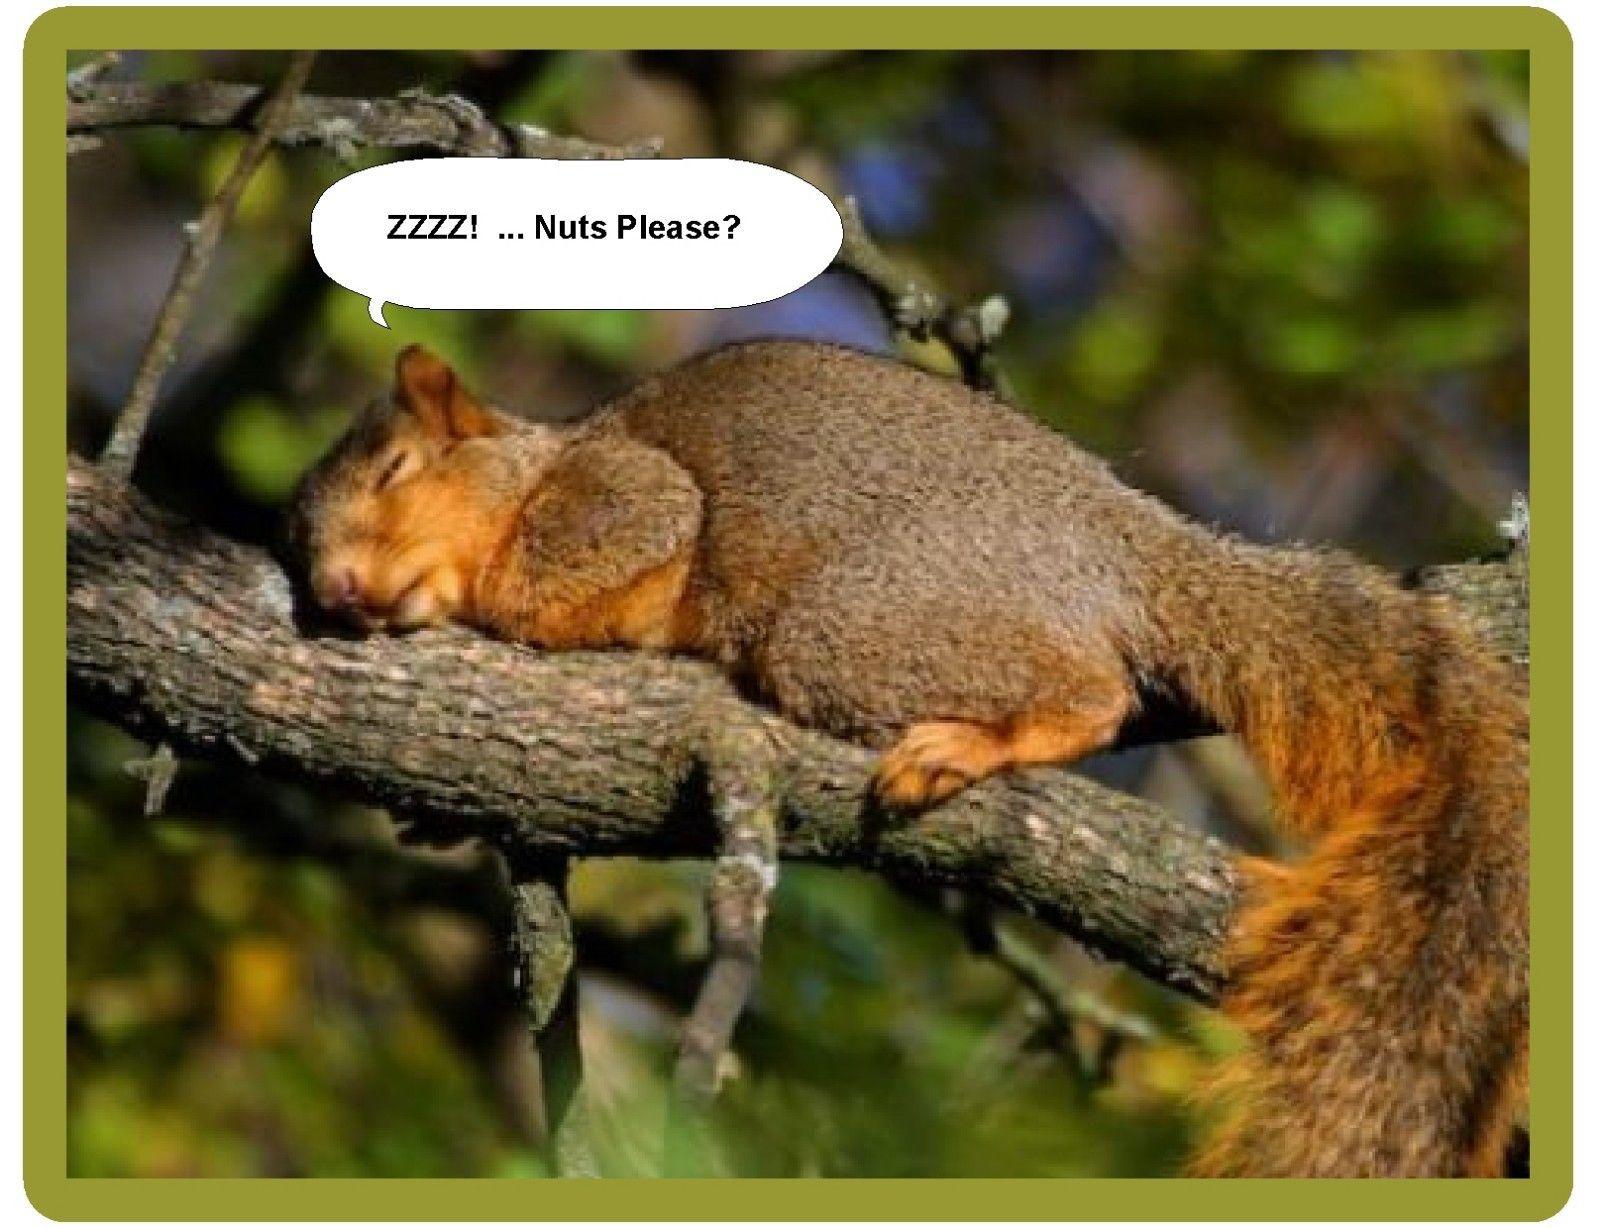 5 5 Funny Squirrel Sleeping Refrigerator Tool Box